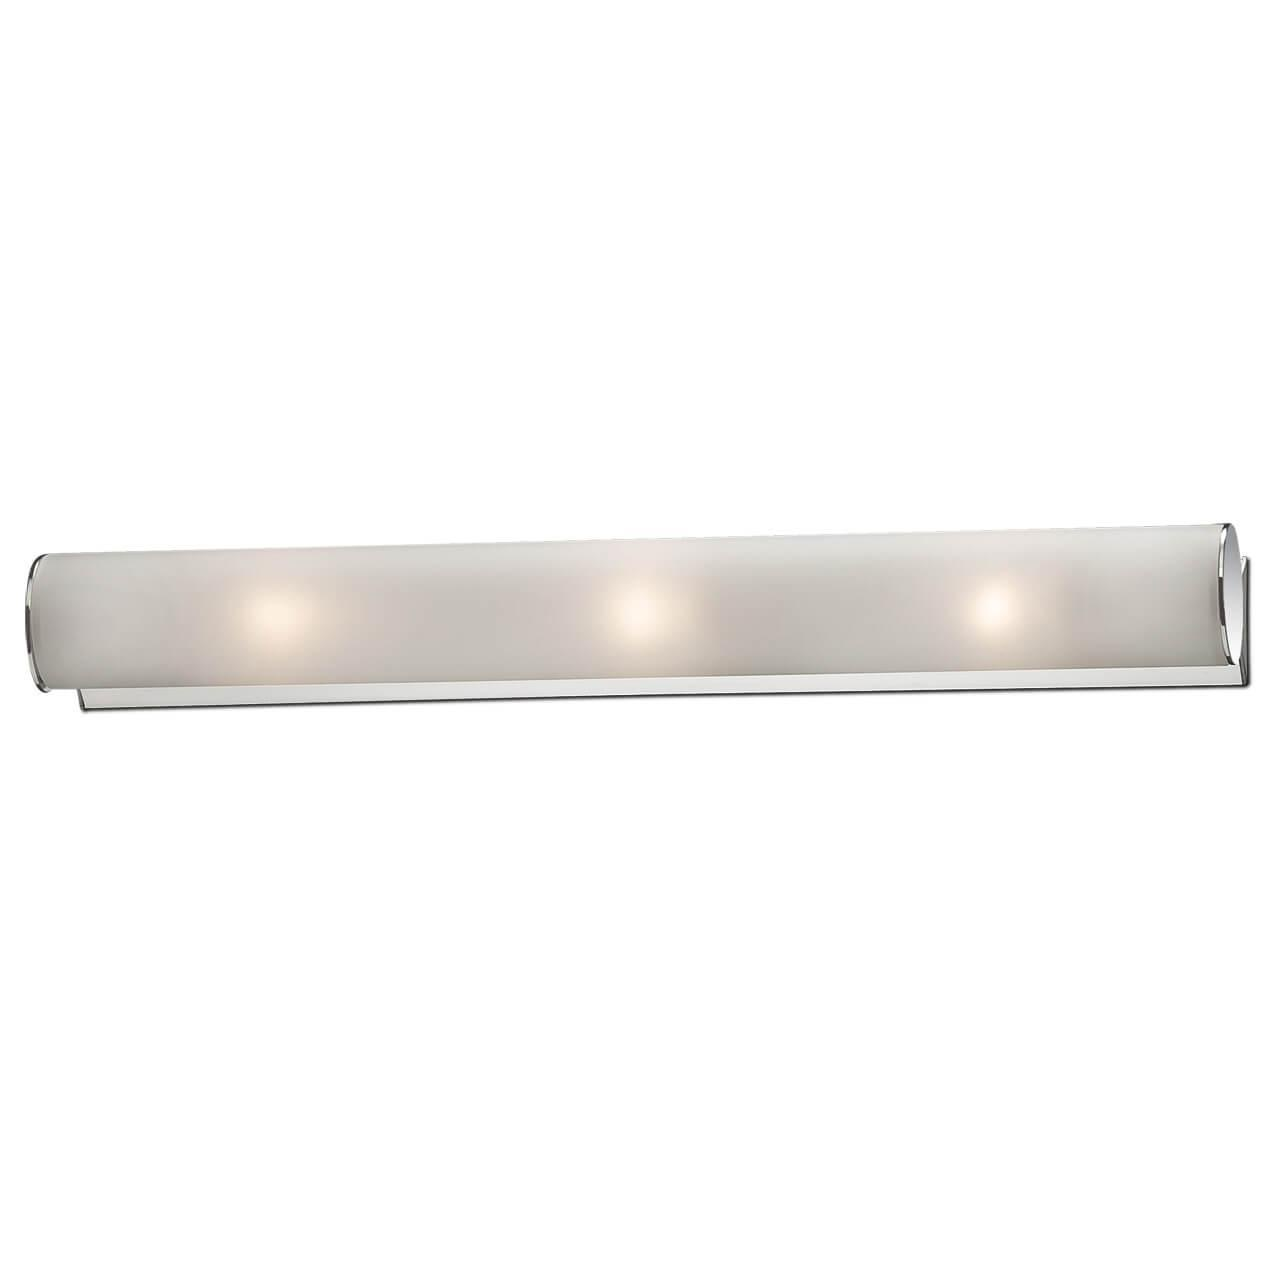 Настенный светильник Odeon Light 2028/3W, E14, 40 Вт odeon light wiron 2035 3w